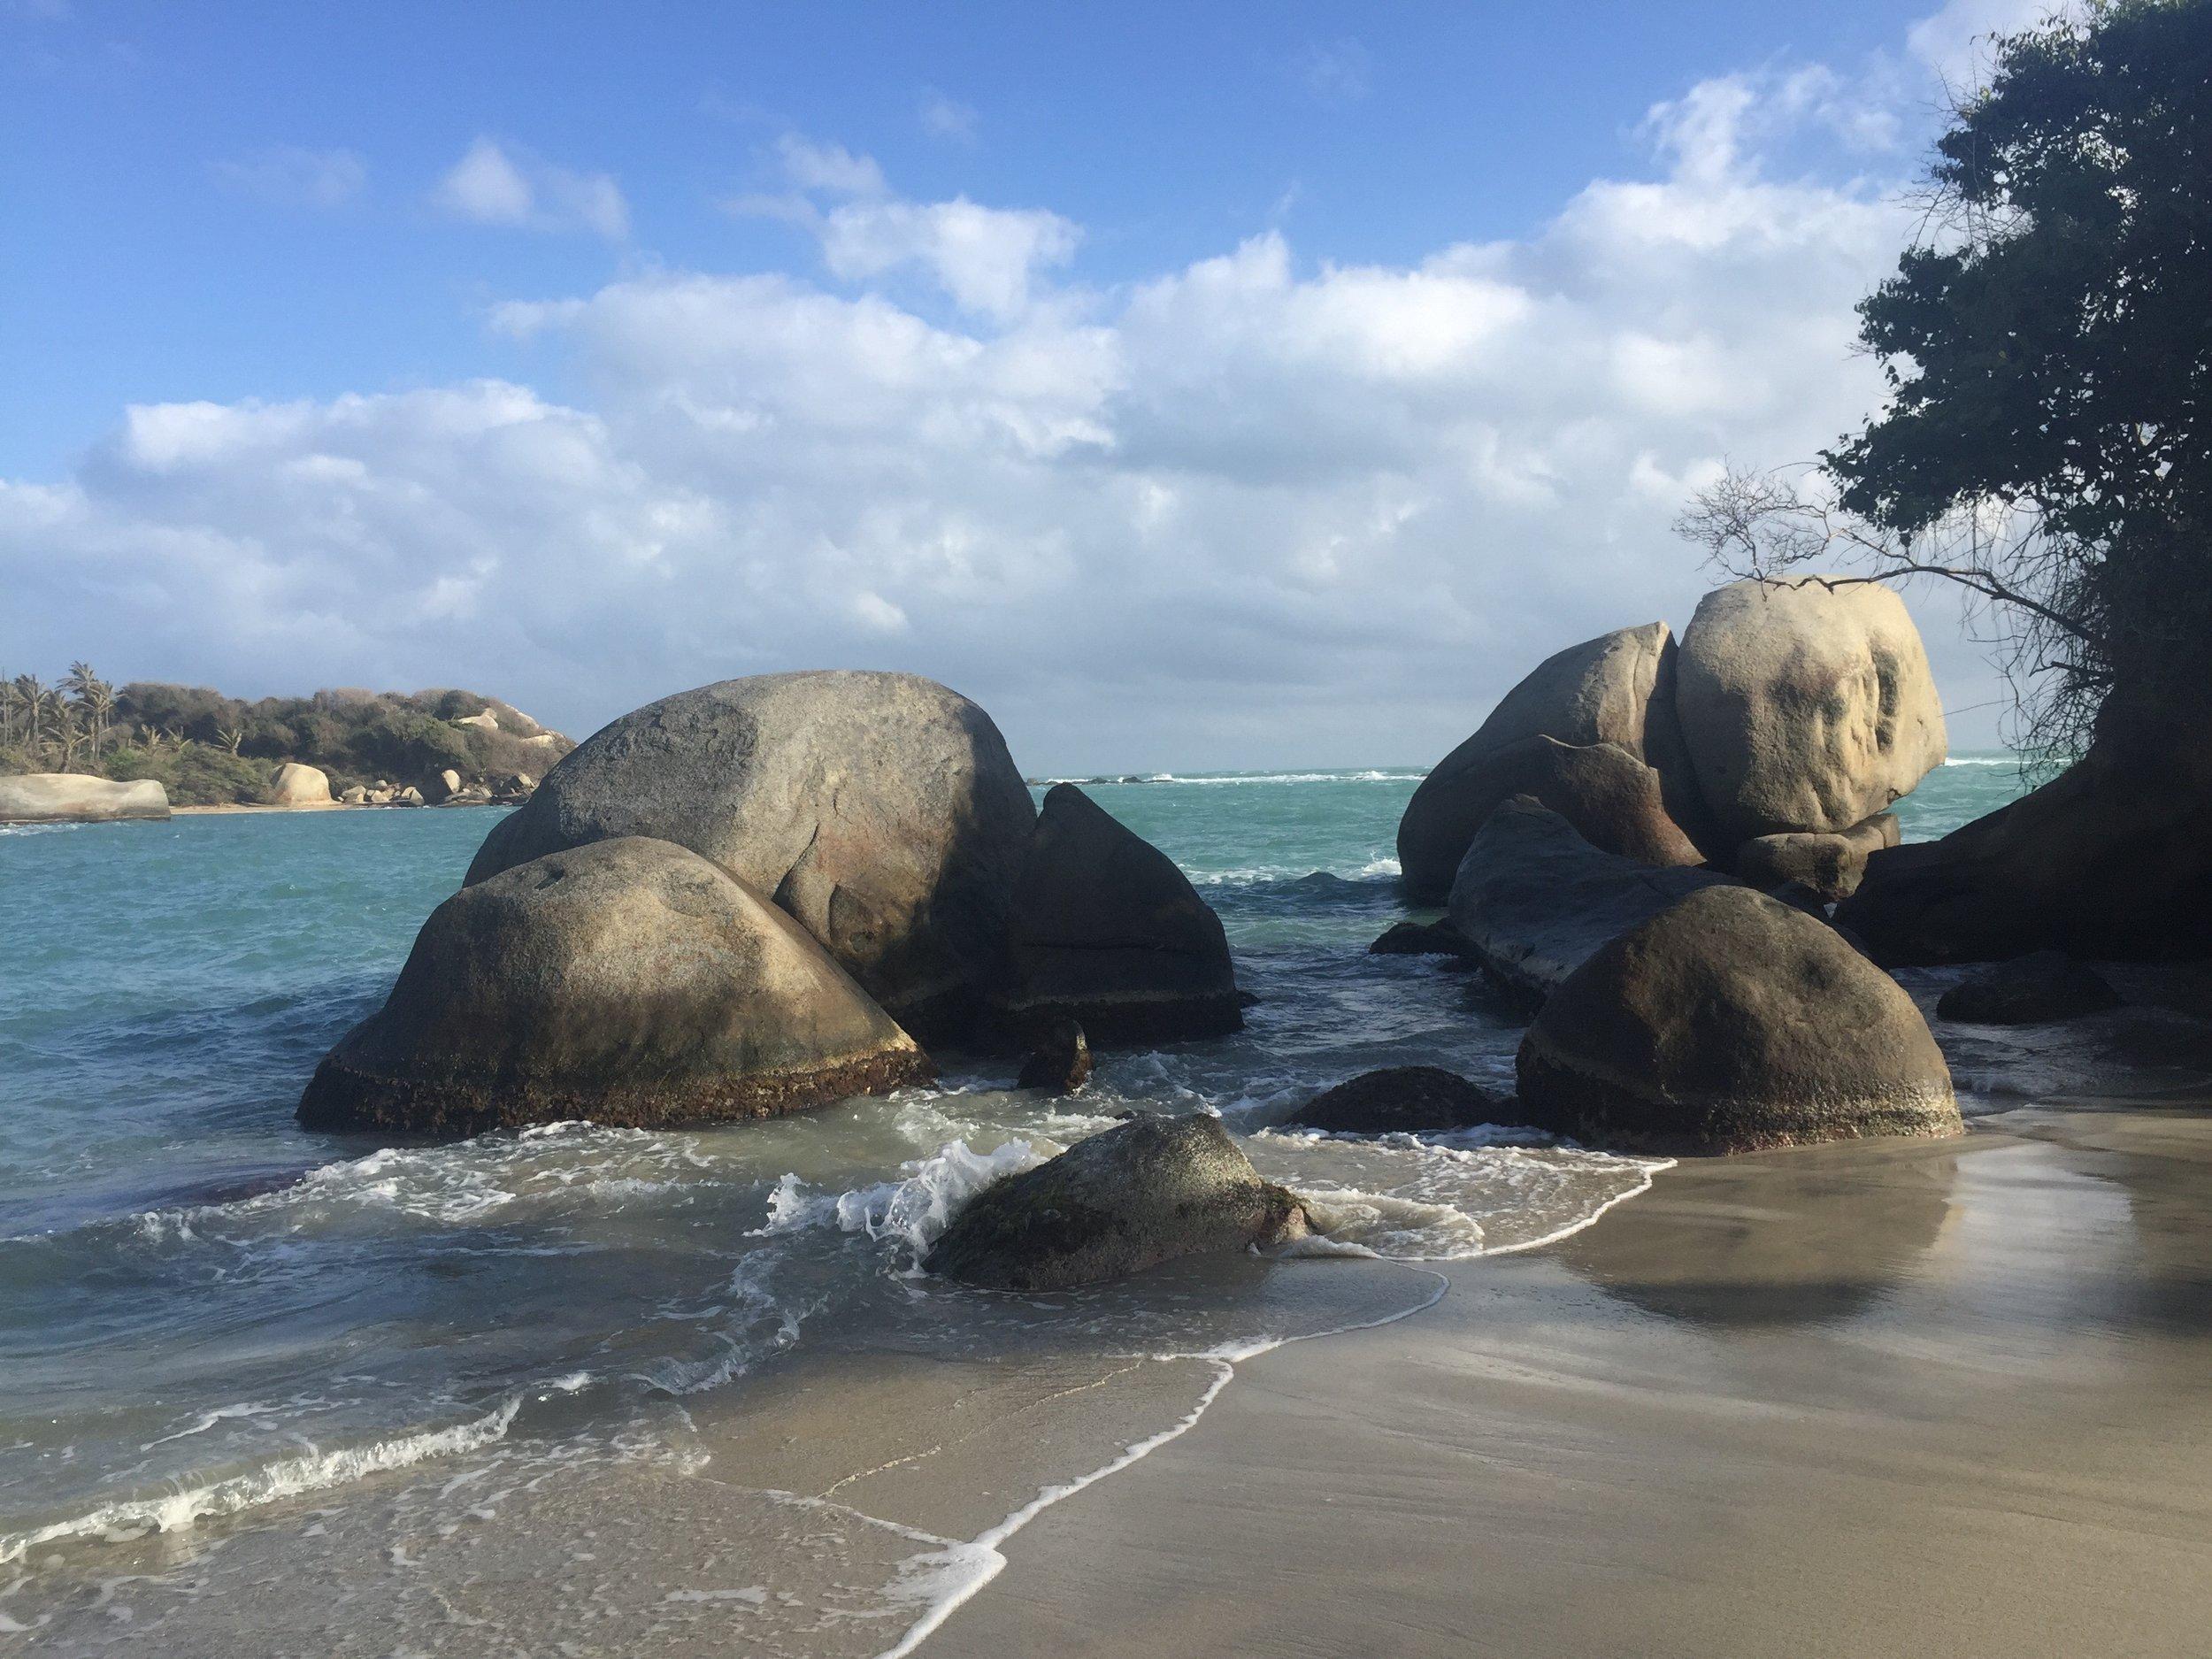 Playa Tayrona, Colombia